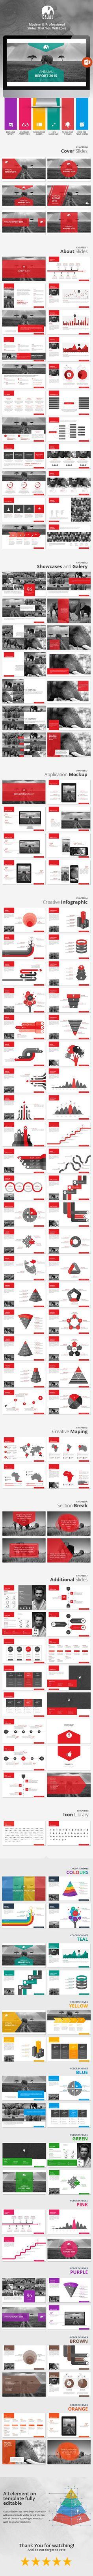 Gajah - Annual Report Powerpoint Template PowerPoint Template / Theme / Presentation / Slides / Background / Power Point #powerpoint #template #theme: